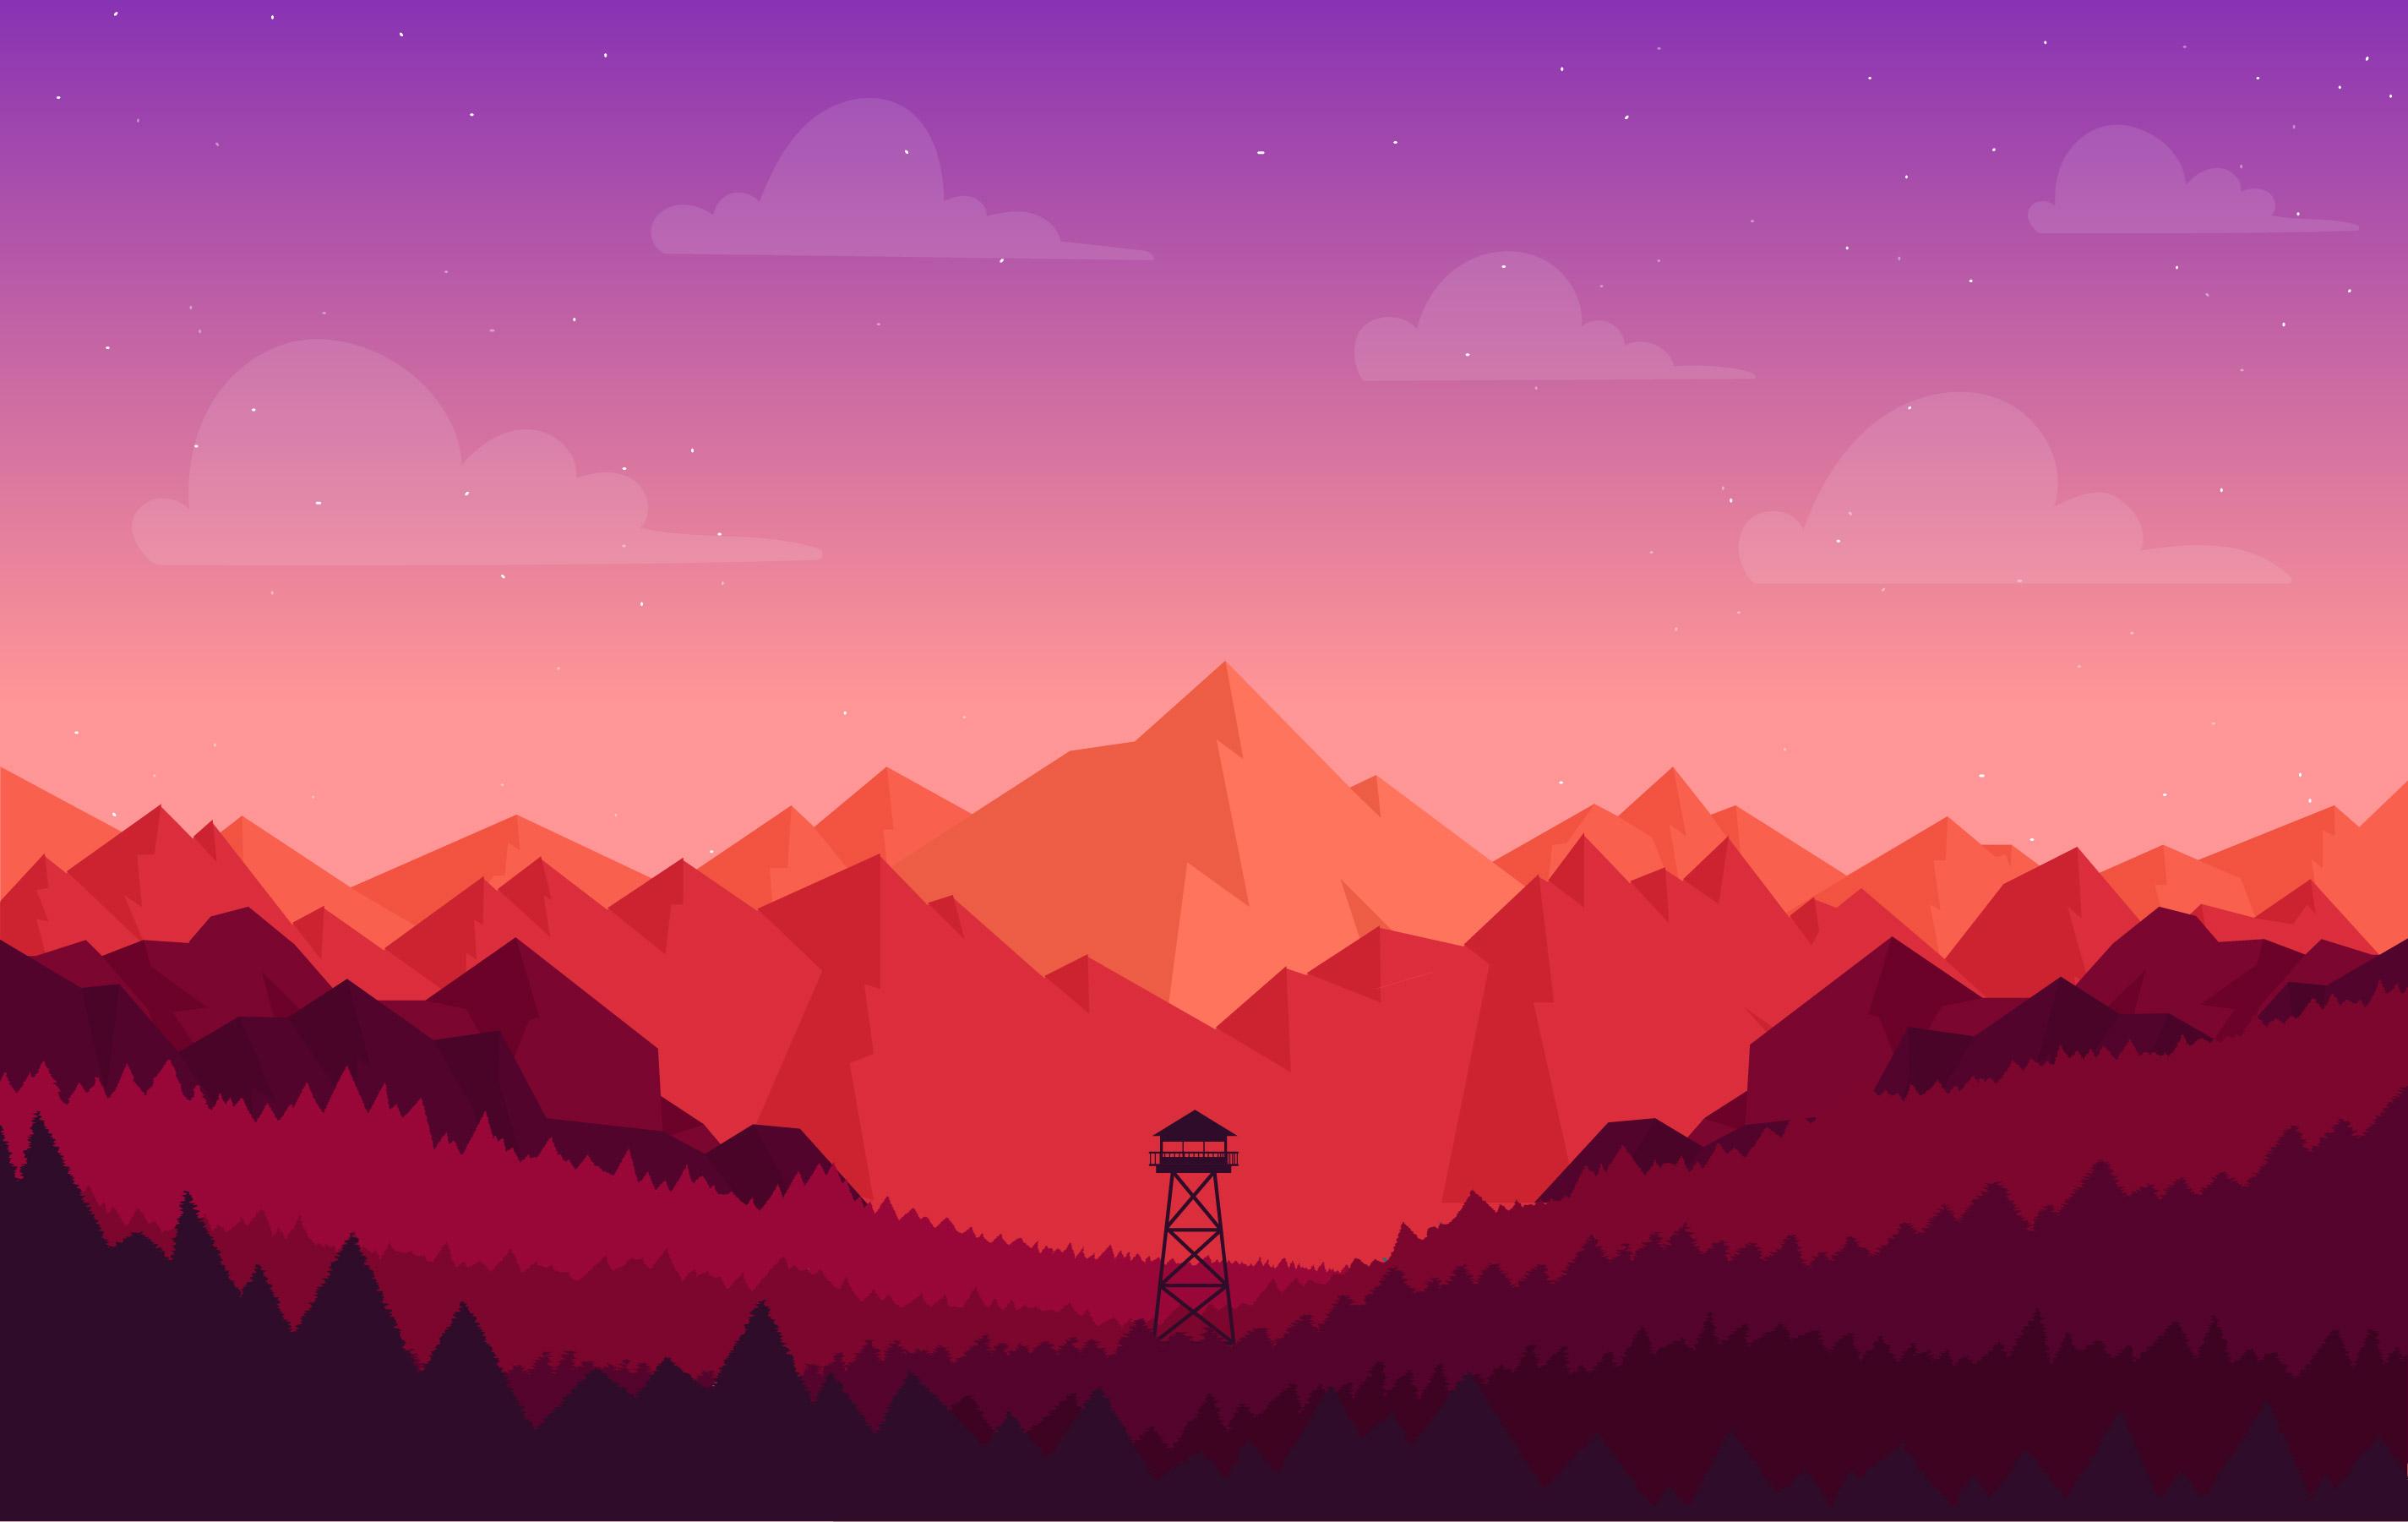 Landscape Illustration Vector Free: Vector Colourful Landscape Illustration